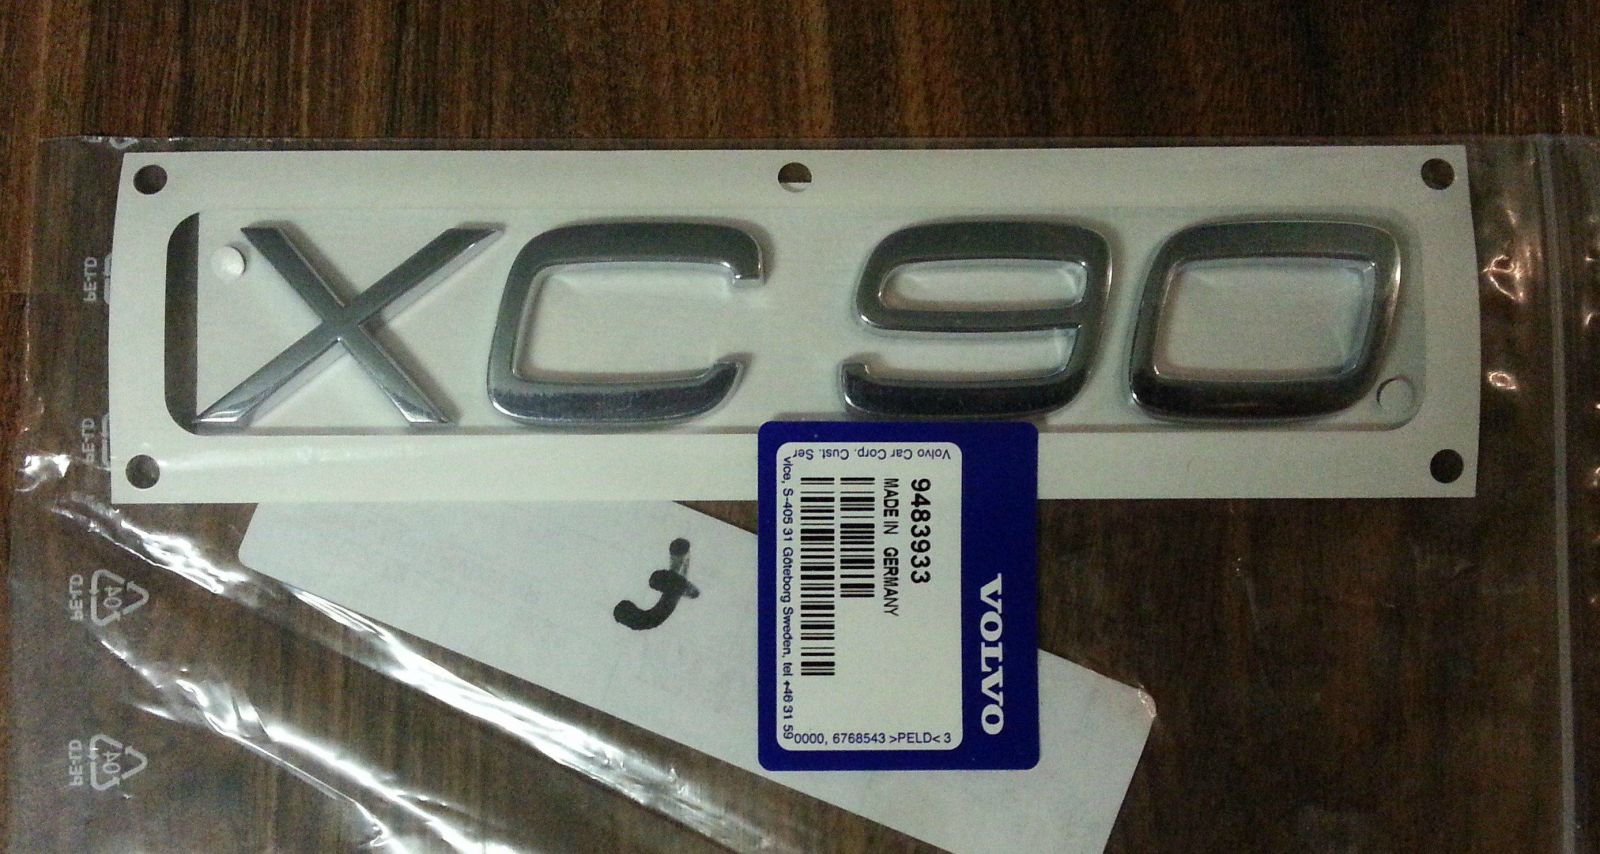 XC90 (9483933)